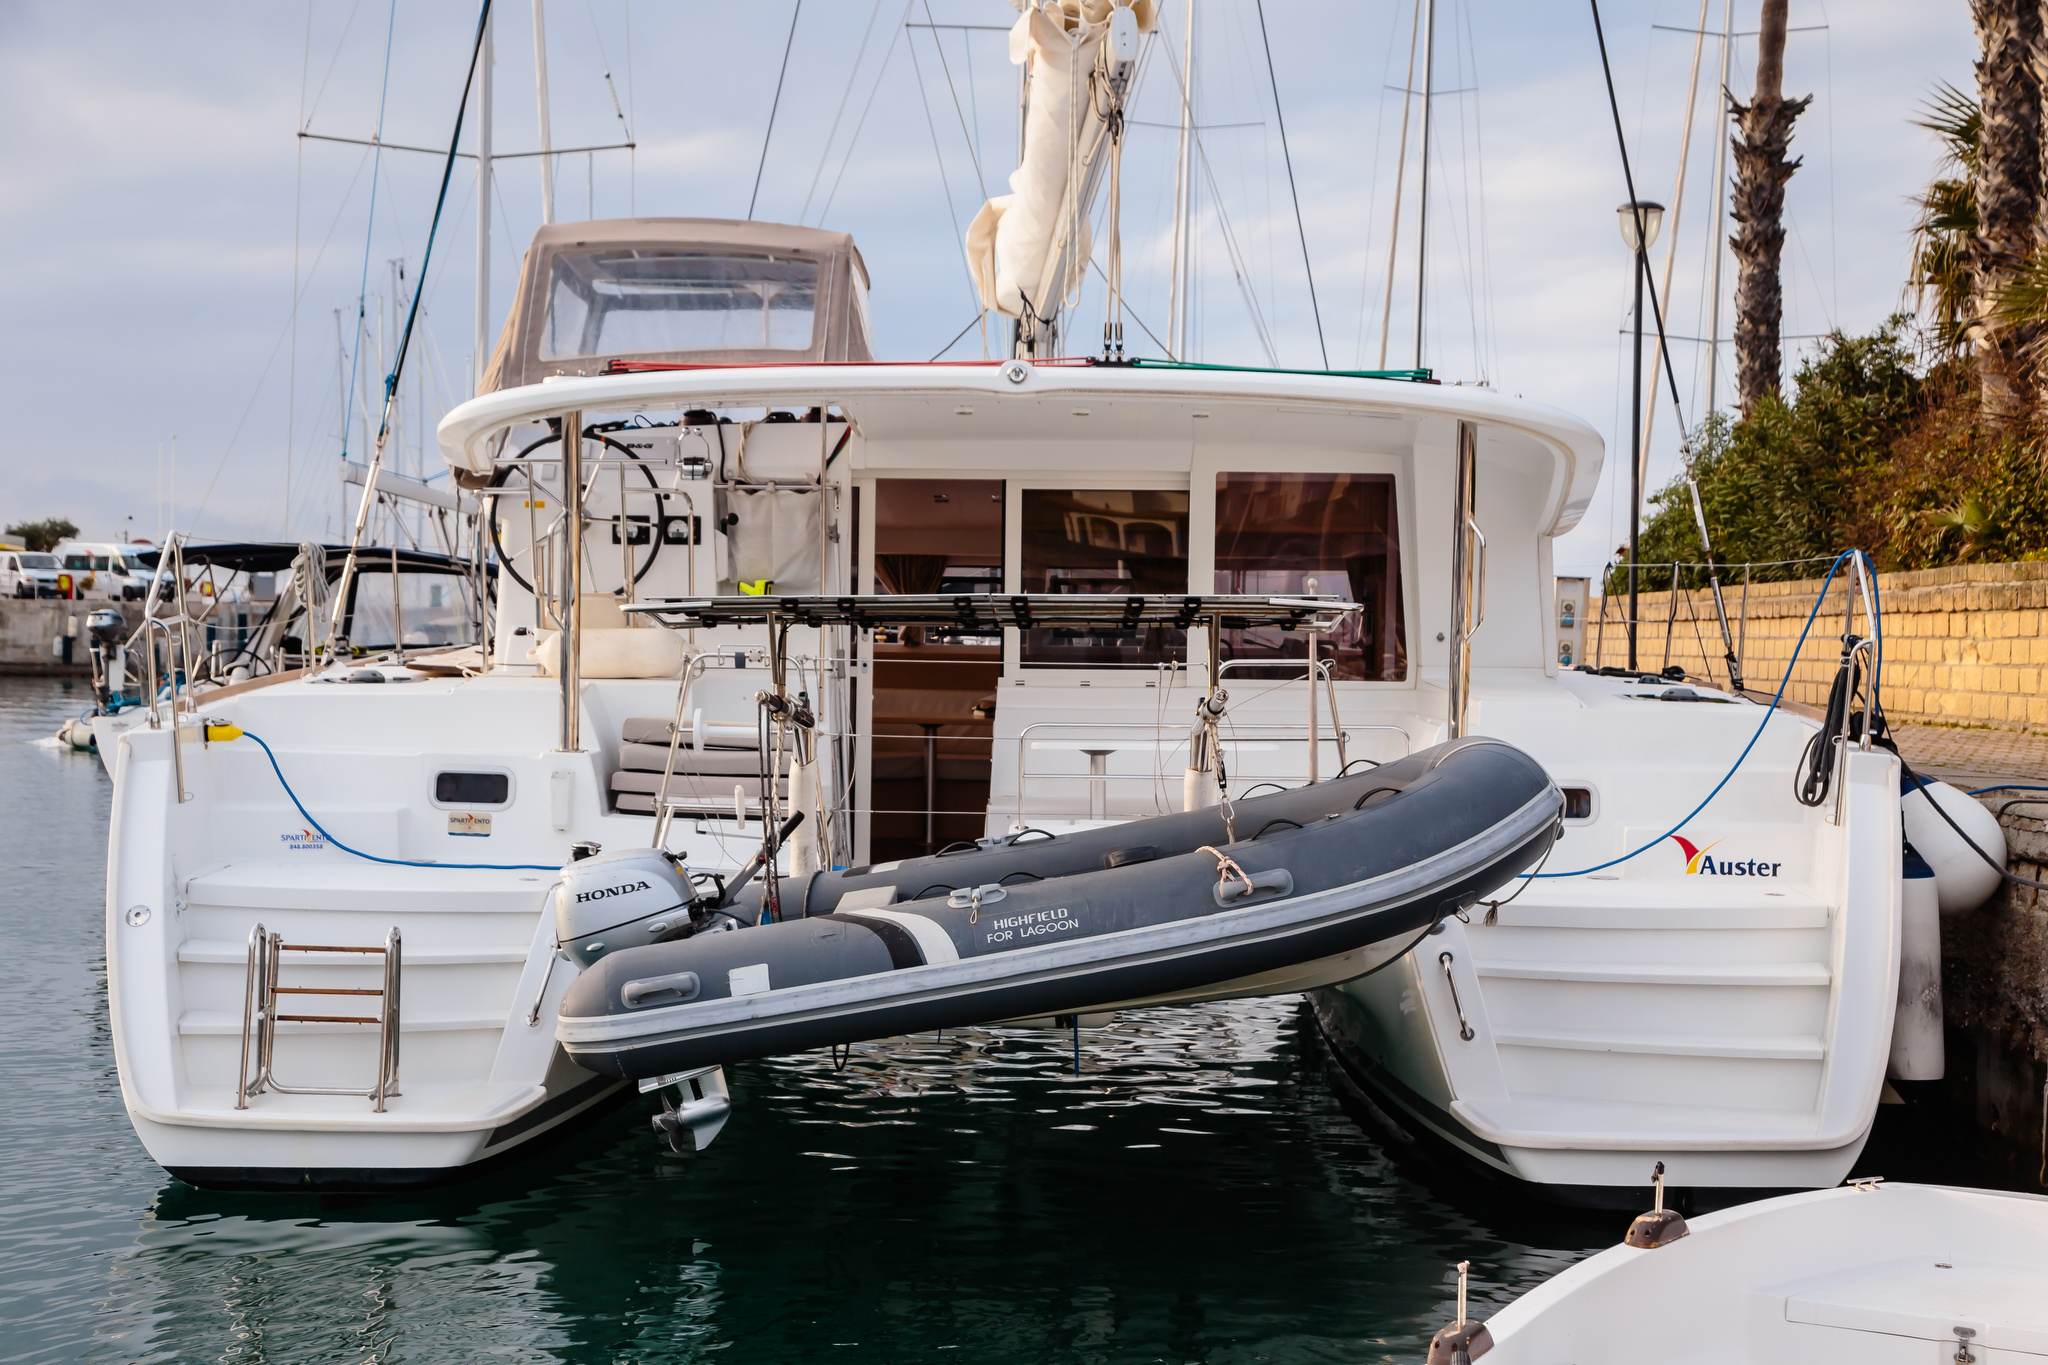 Lagoon 400 S2 (Auster) poppa - 10